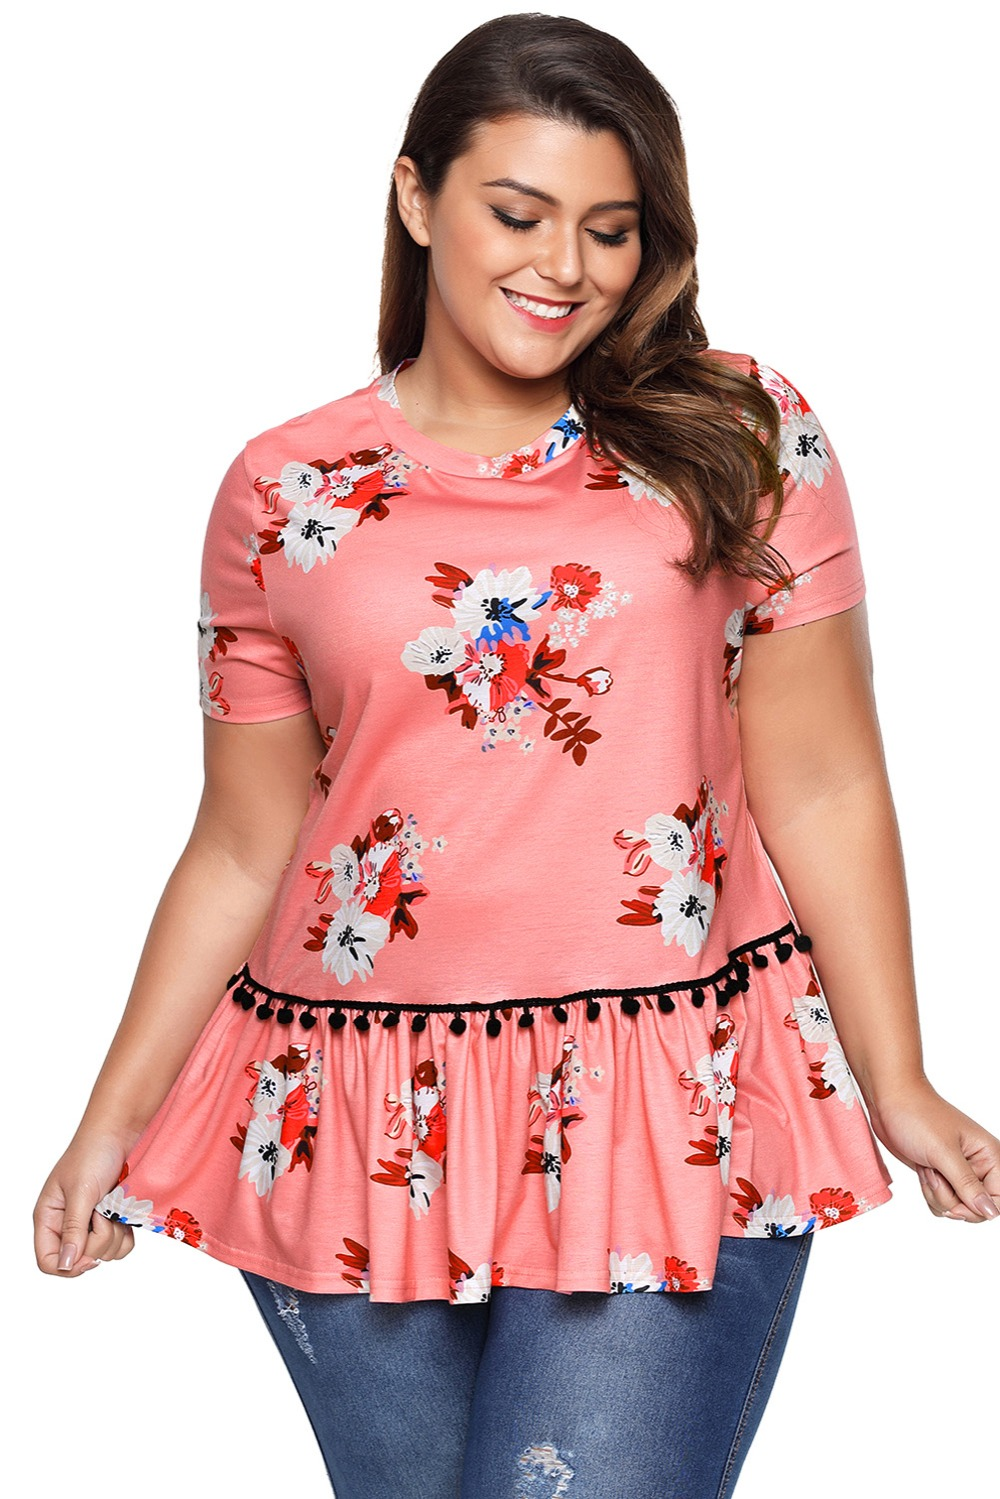 a7c7eec4c0d40 Zmvkgsoa T Shirt Women Plus Size Fashion Floral Print T-Shirt Ruffle  Elegant Summer Brand Tshirts Blusa Femenina 2018 VV250862